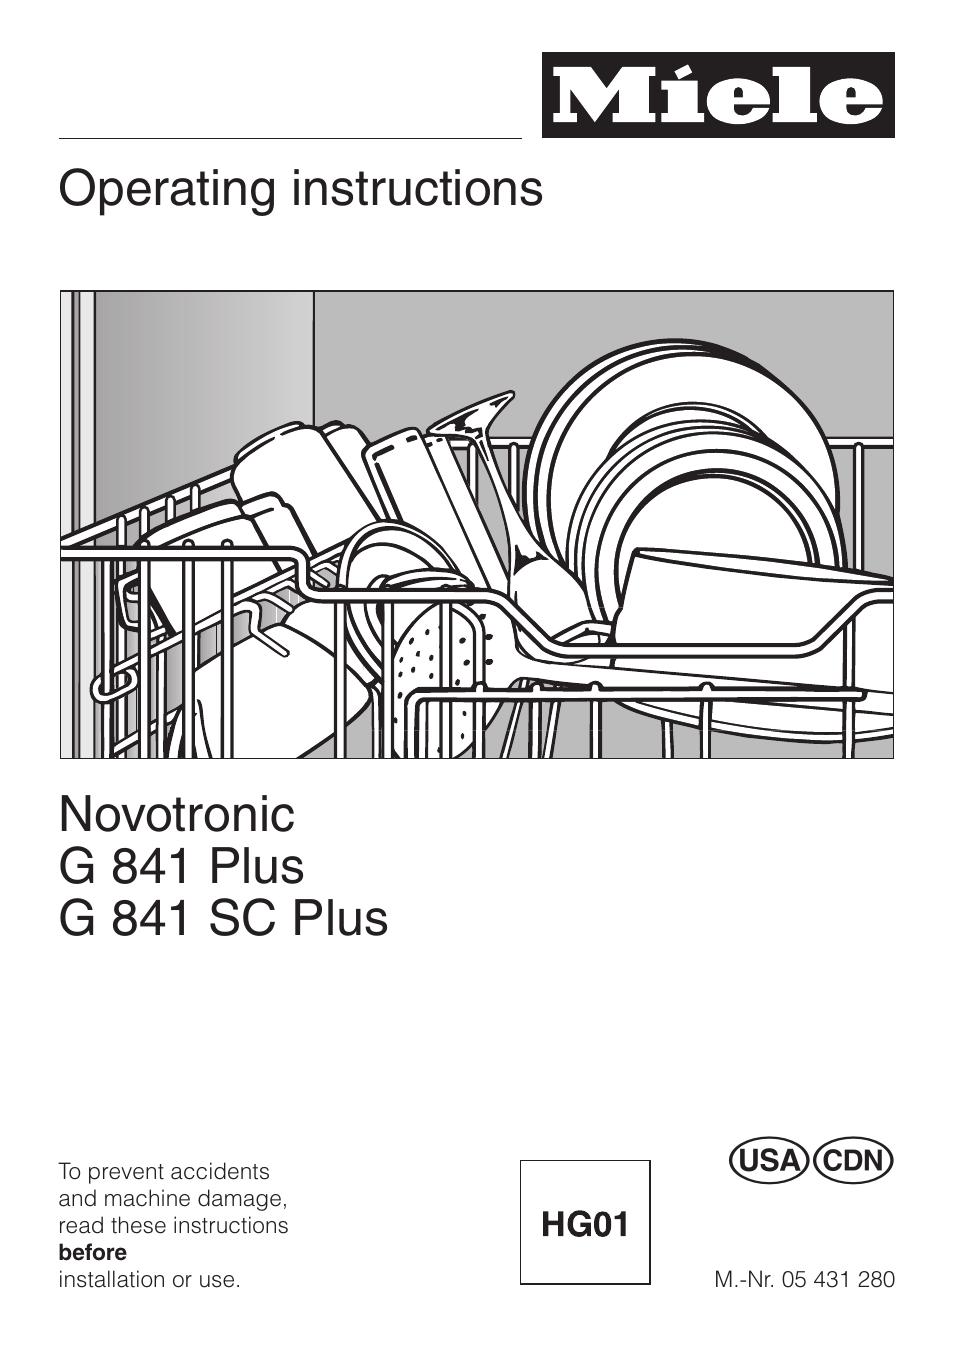 Miele Dishwasher G841 Manual Wiring Diagram For Asko Novotronic G 841 Plus User 48 Pages Rh Manualsdir Com Bosch